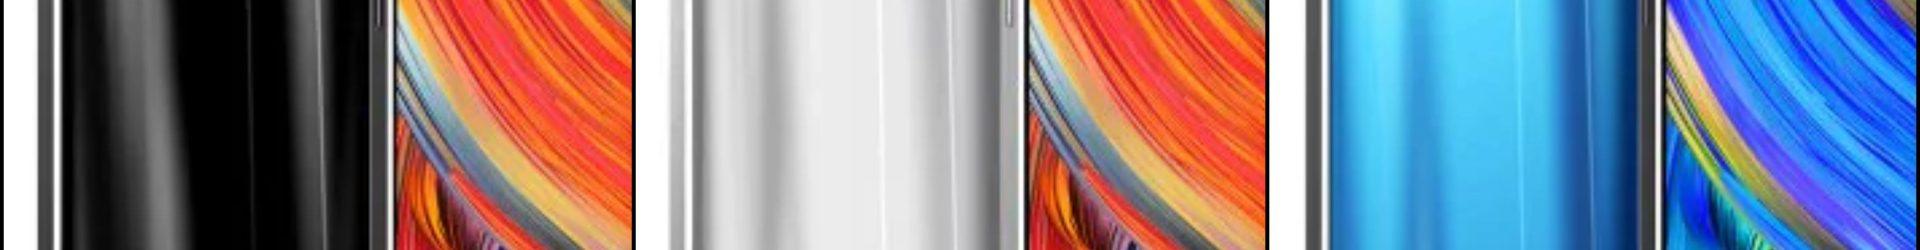 HomTom S9 Plus: un nuovo smartphone borderless a 135€ su GearBest